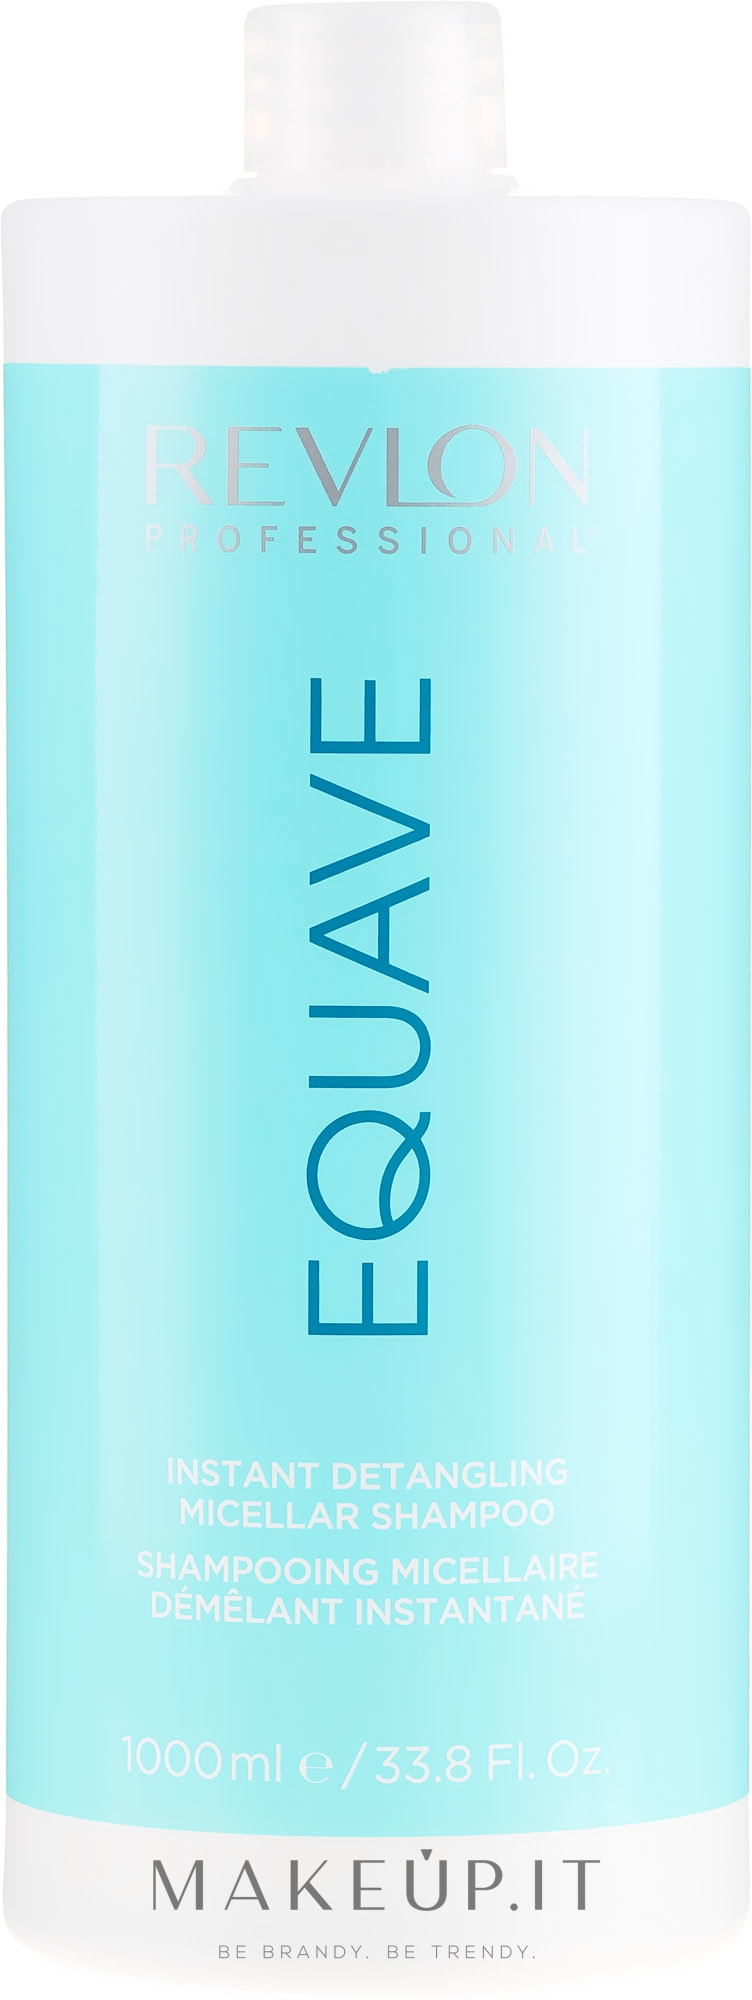 Shampoo micellare - Revlon Professional Equave Instant Detangeling Micellar Shampoo — foto 1000 ml